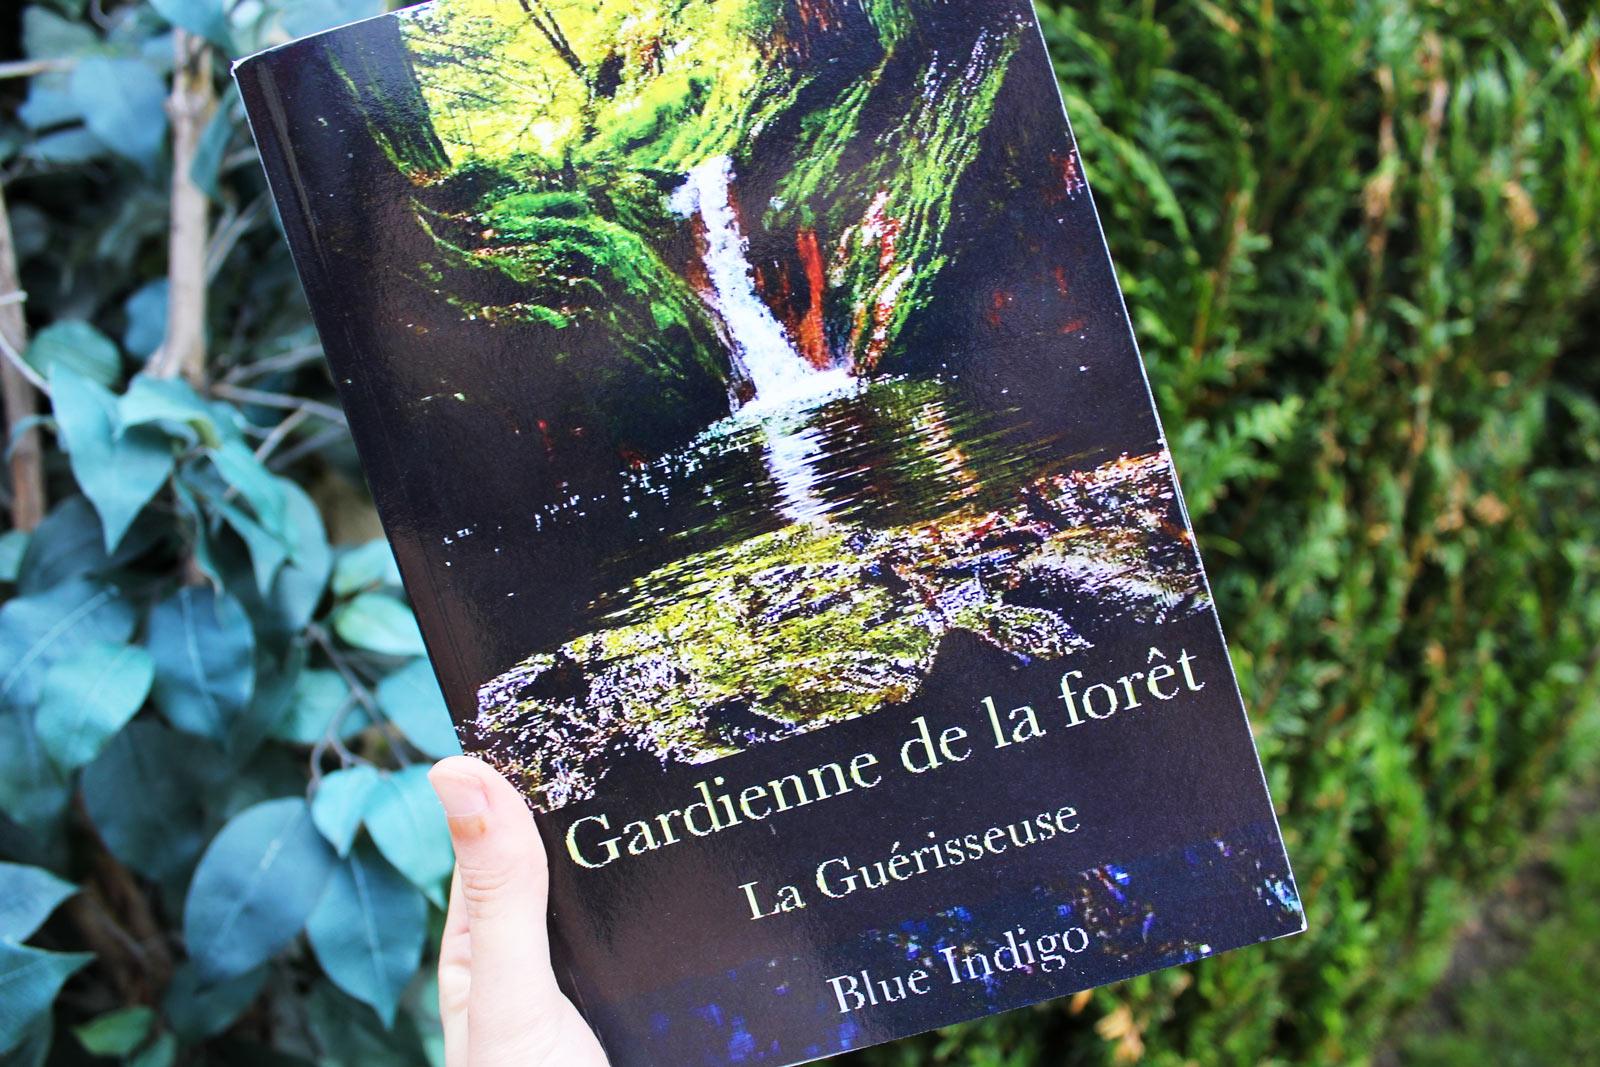 Gardienne de la forêt – Blue Indigo